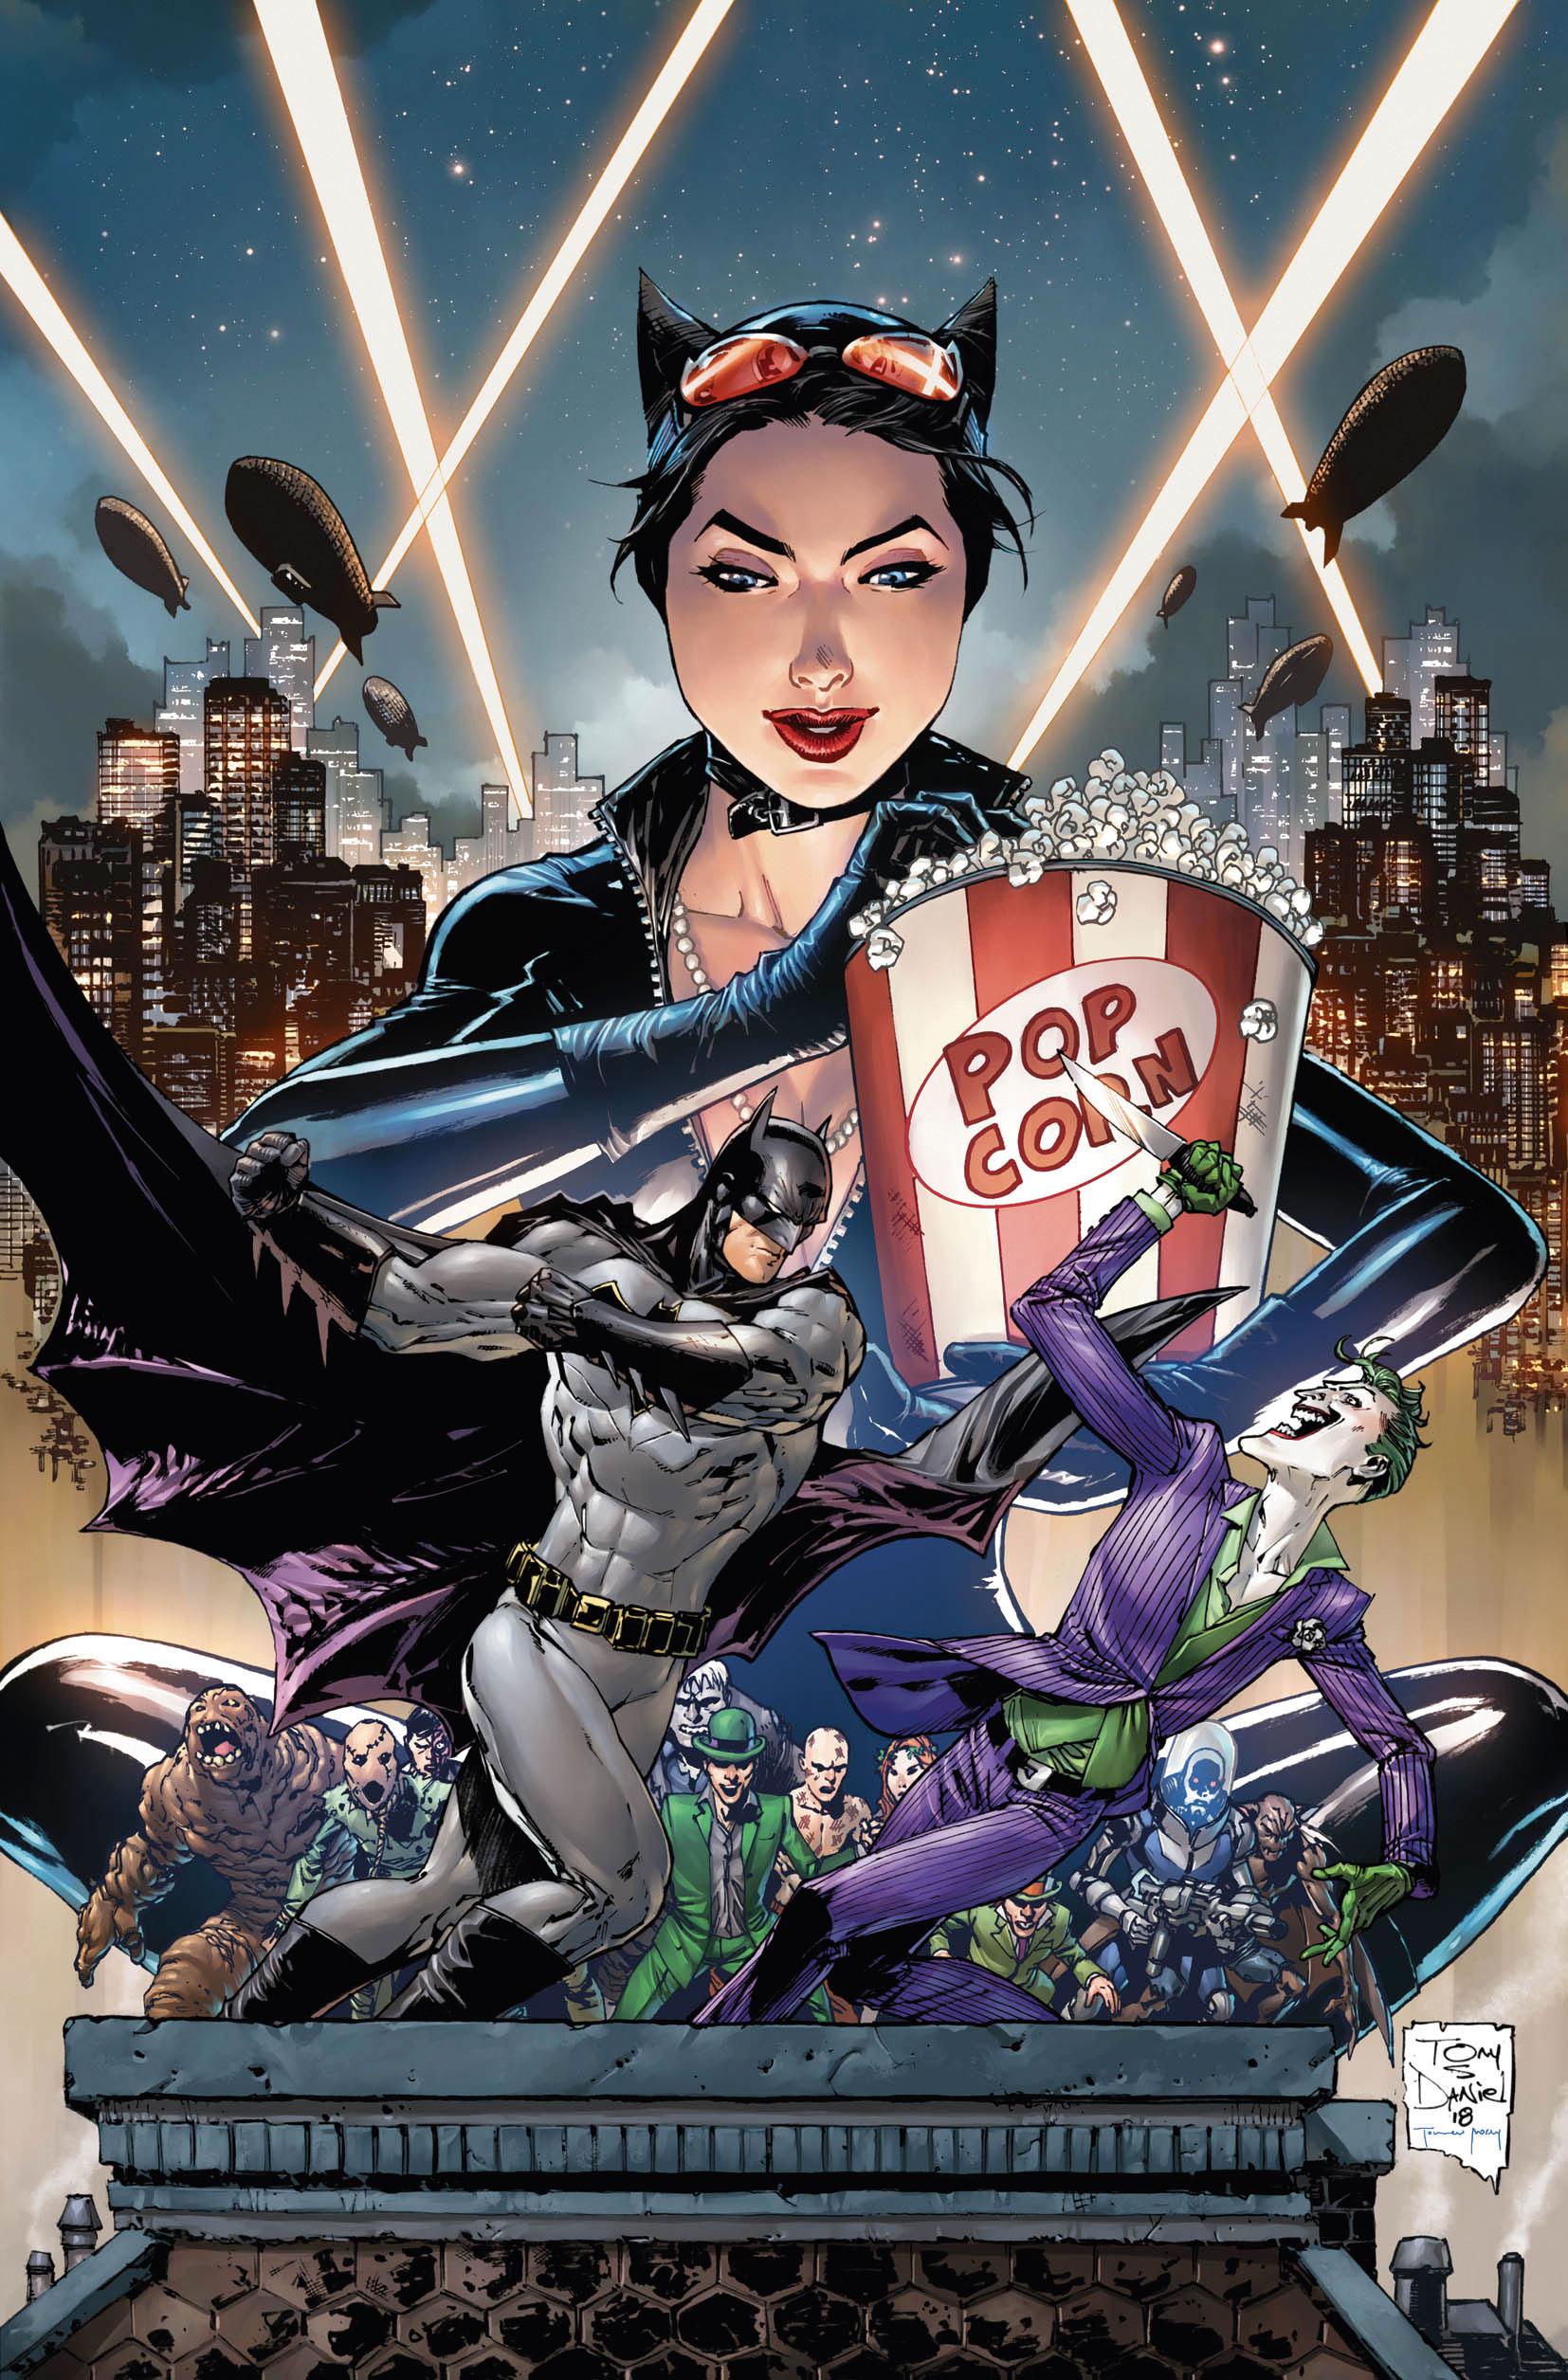 Catwoman feasts on pop corn as she watches Batman fight the Joker